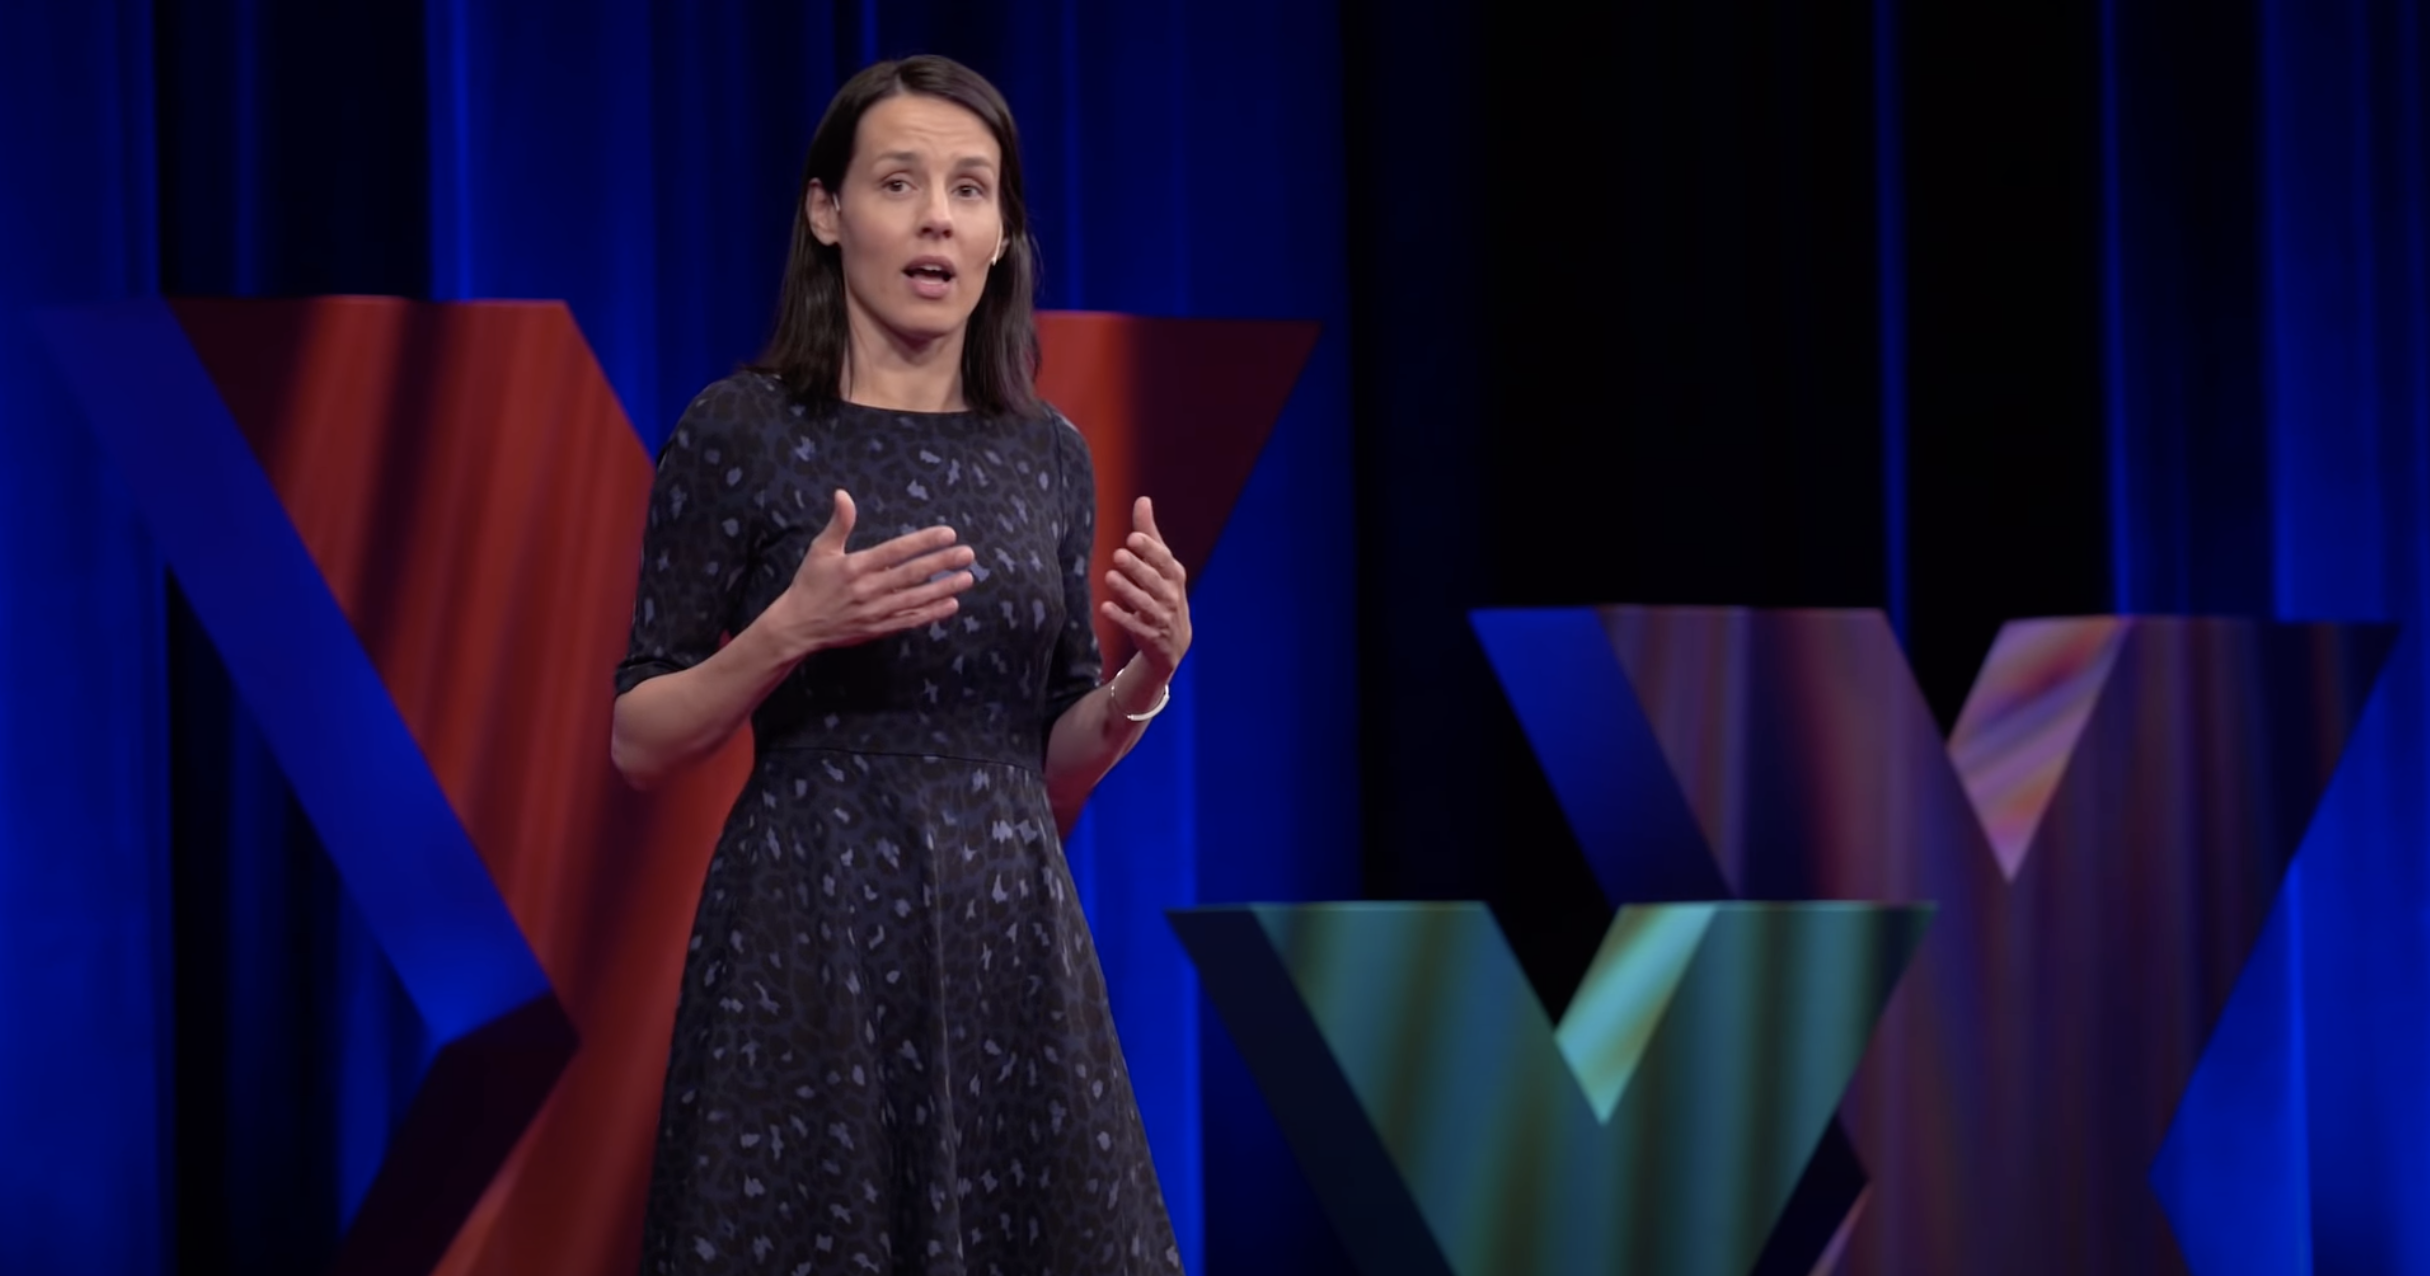 How to break away from habit & follow through on your goals | Sabine Doebel